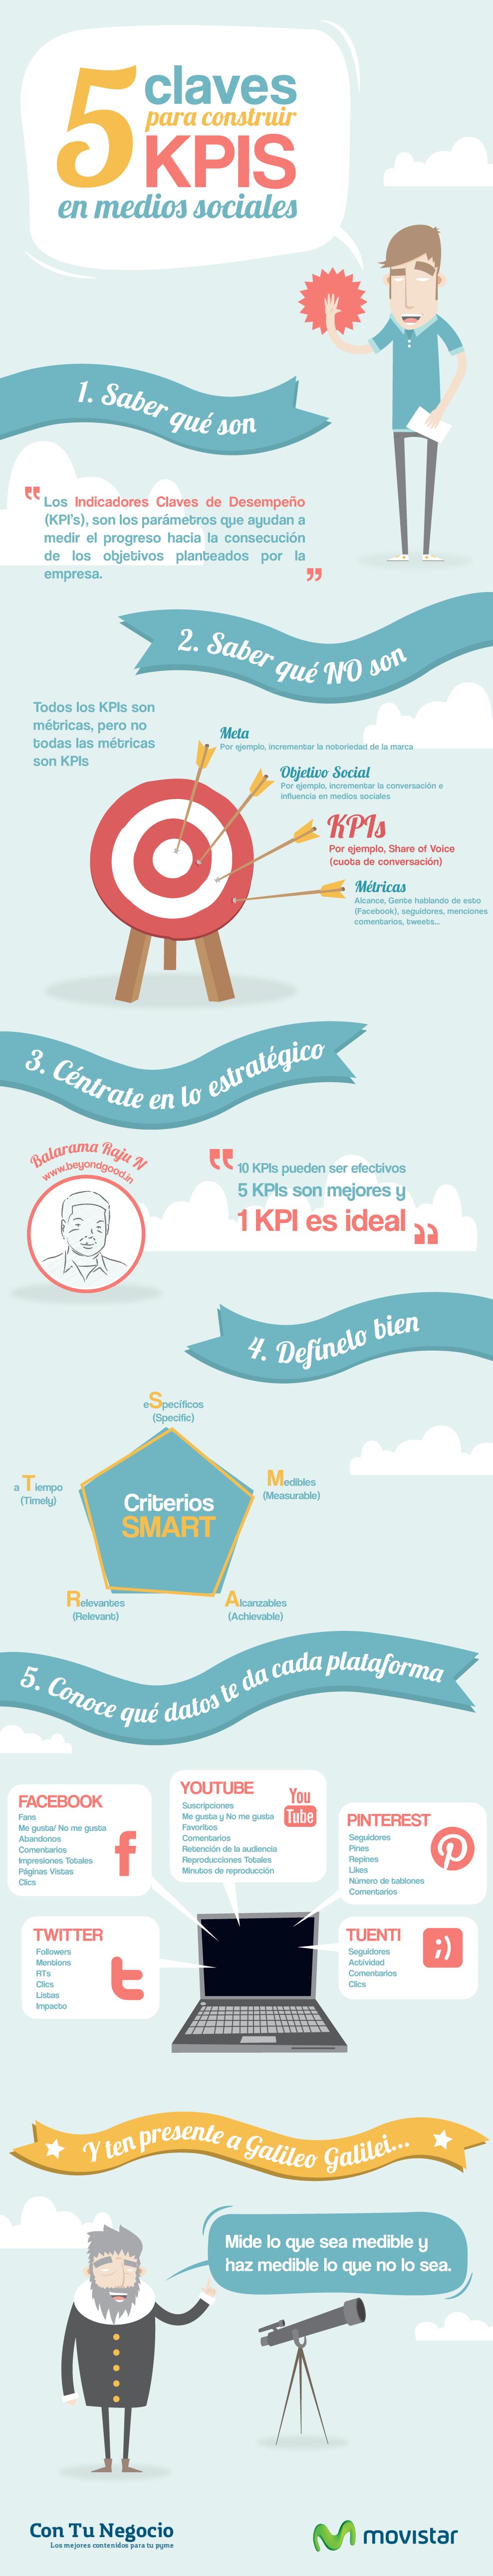 Infografia-KPIs-medios-sociales